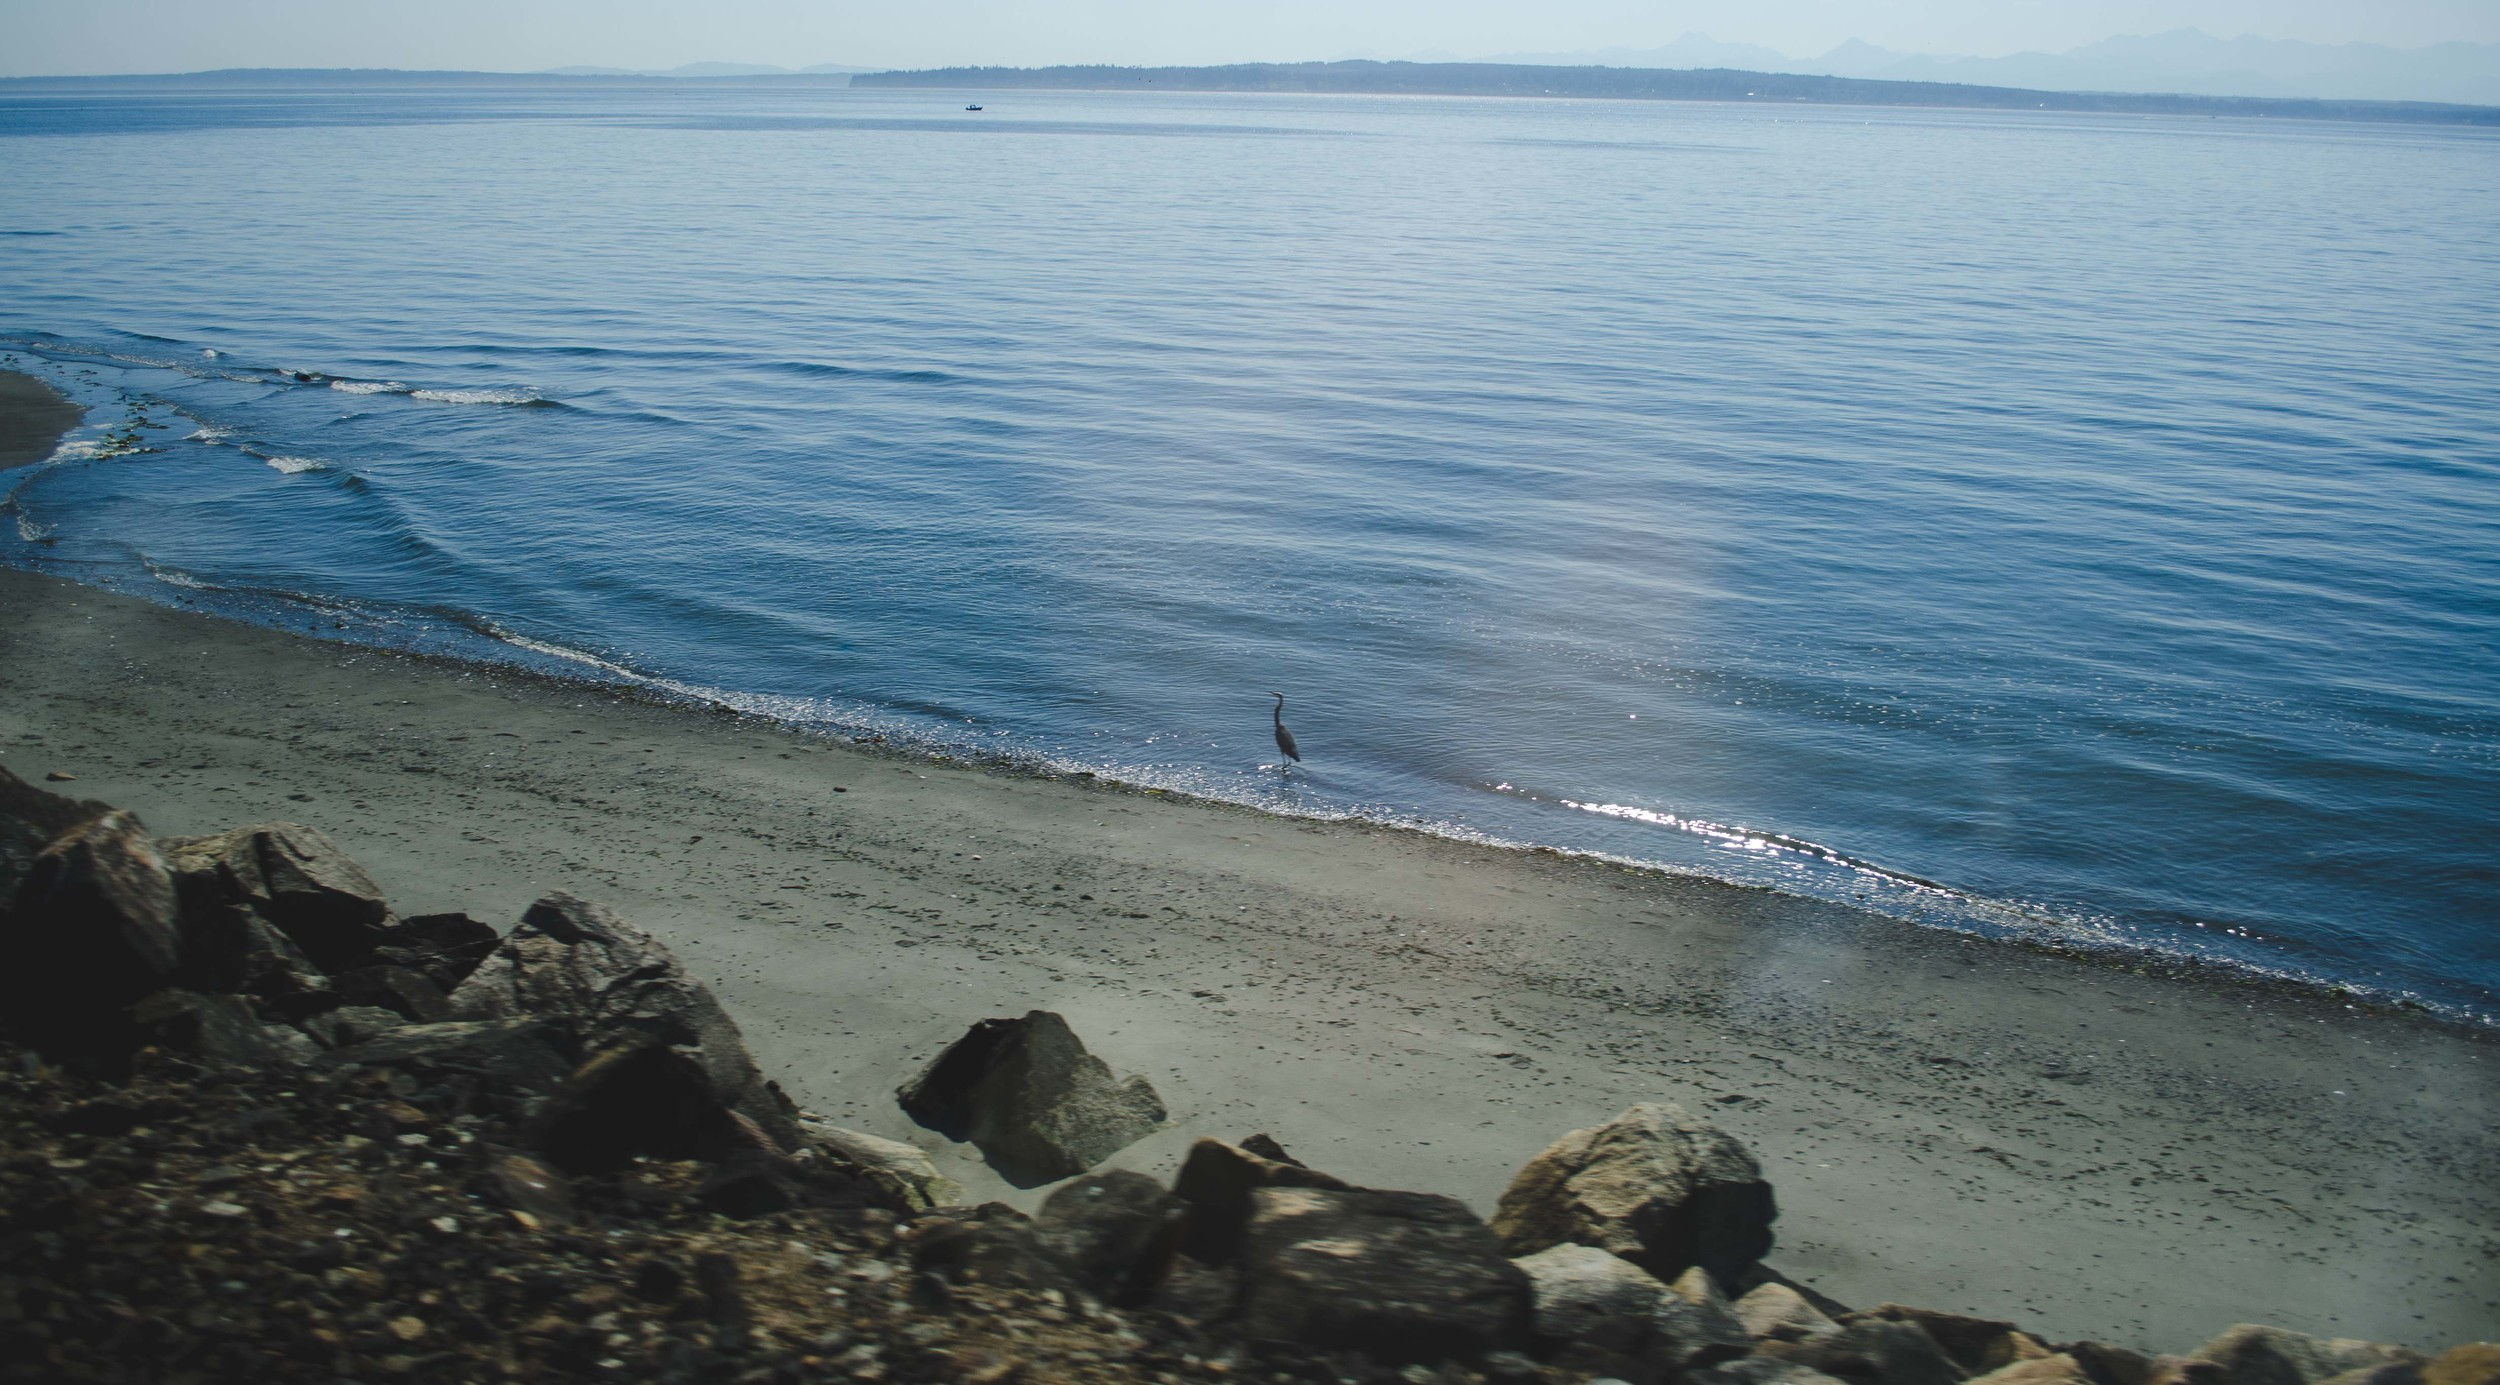 A heron walking along the shoreline